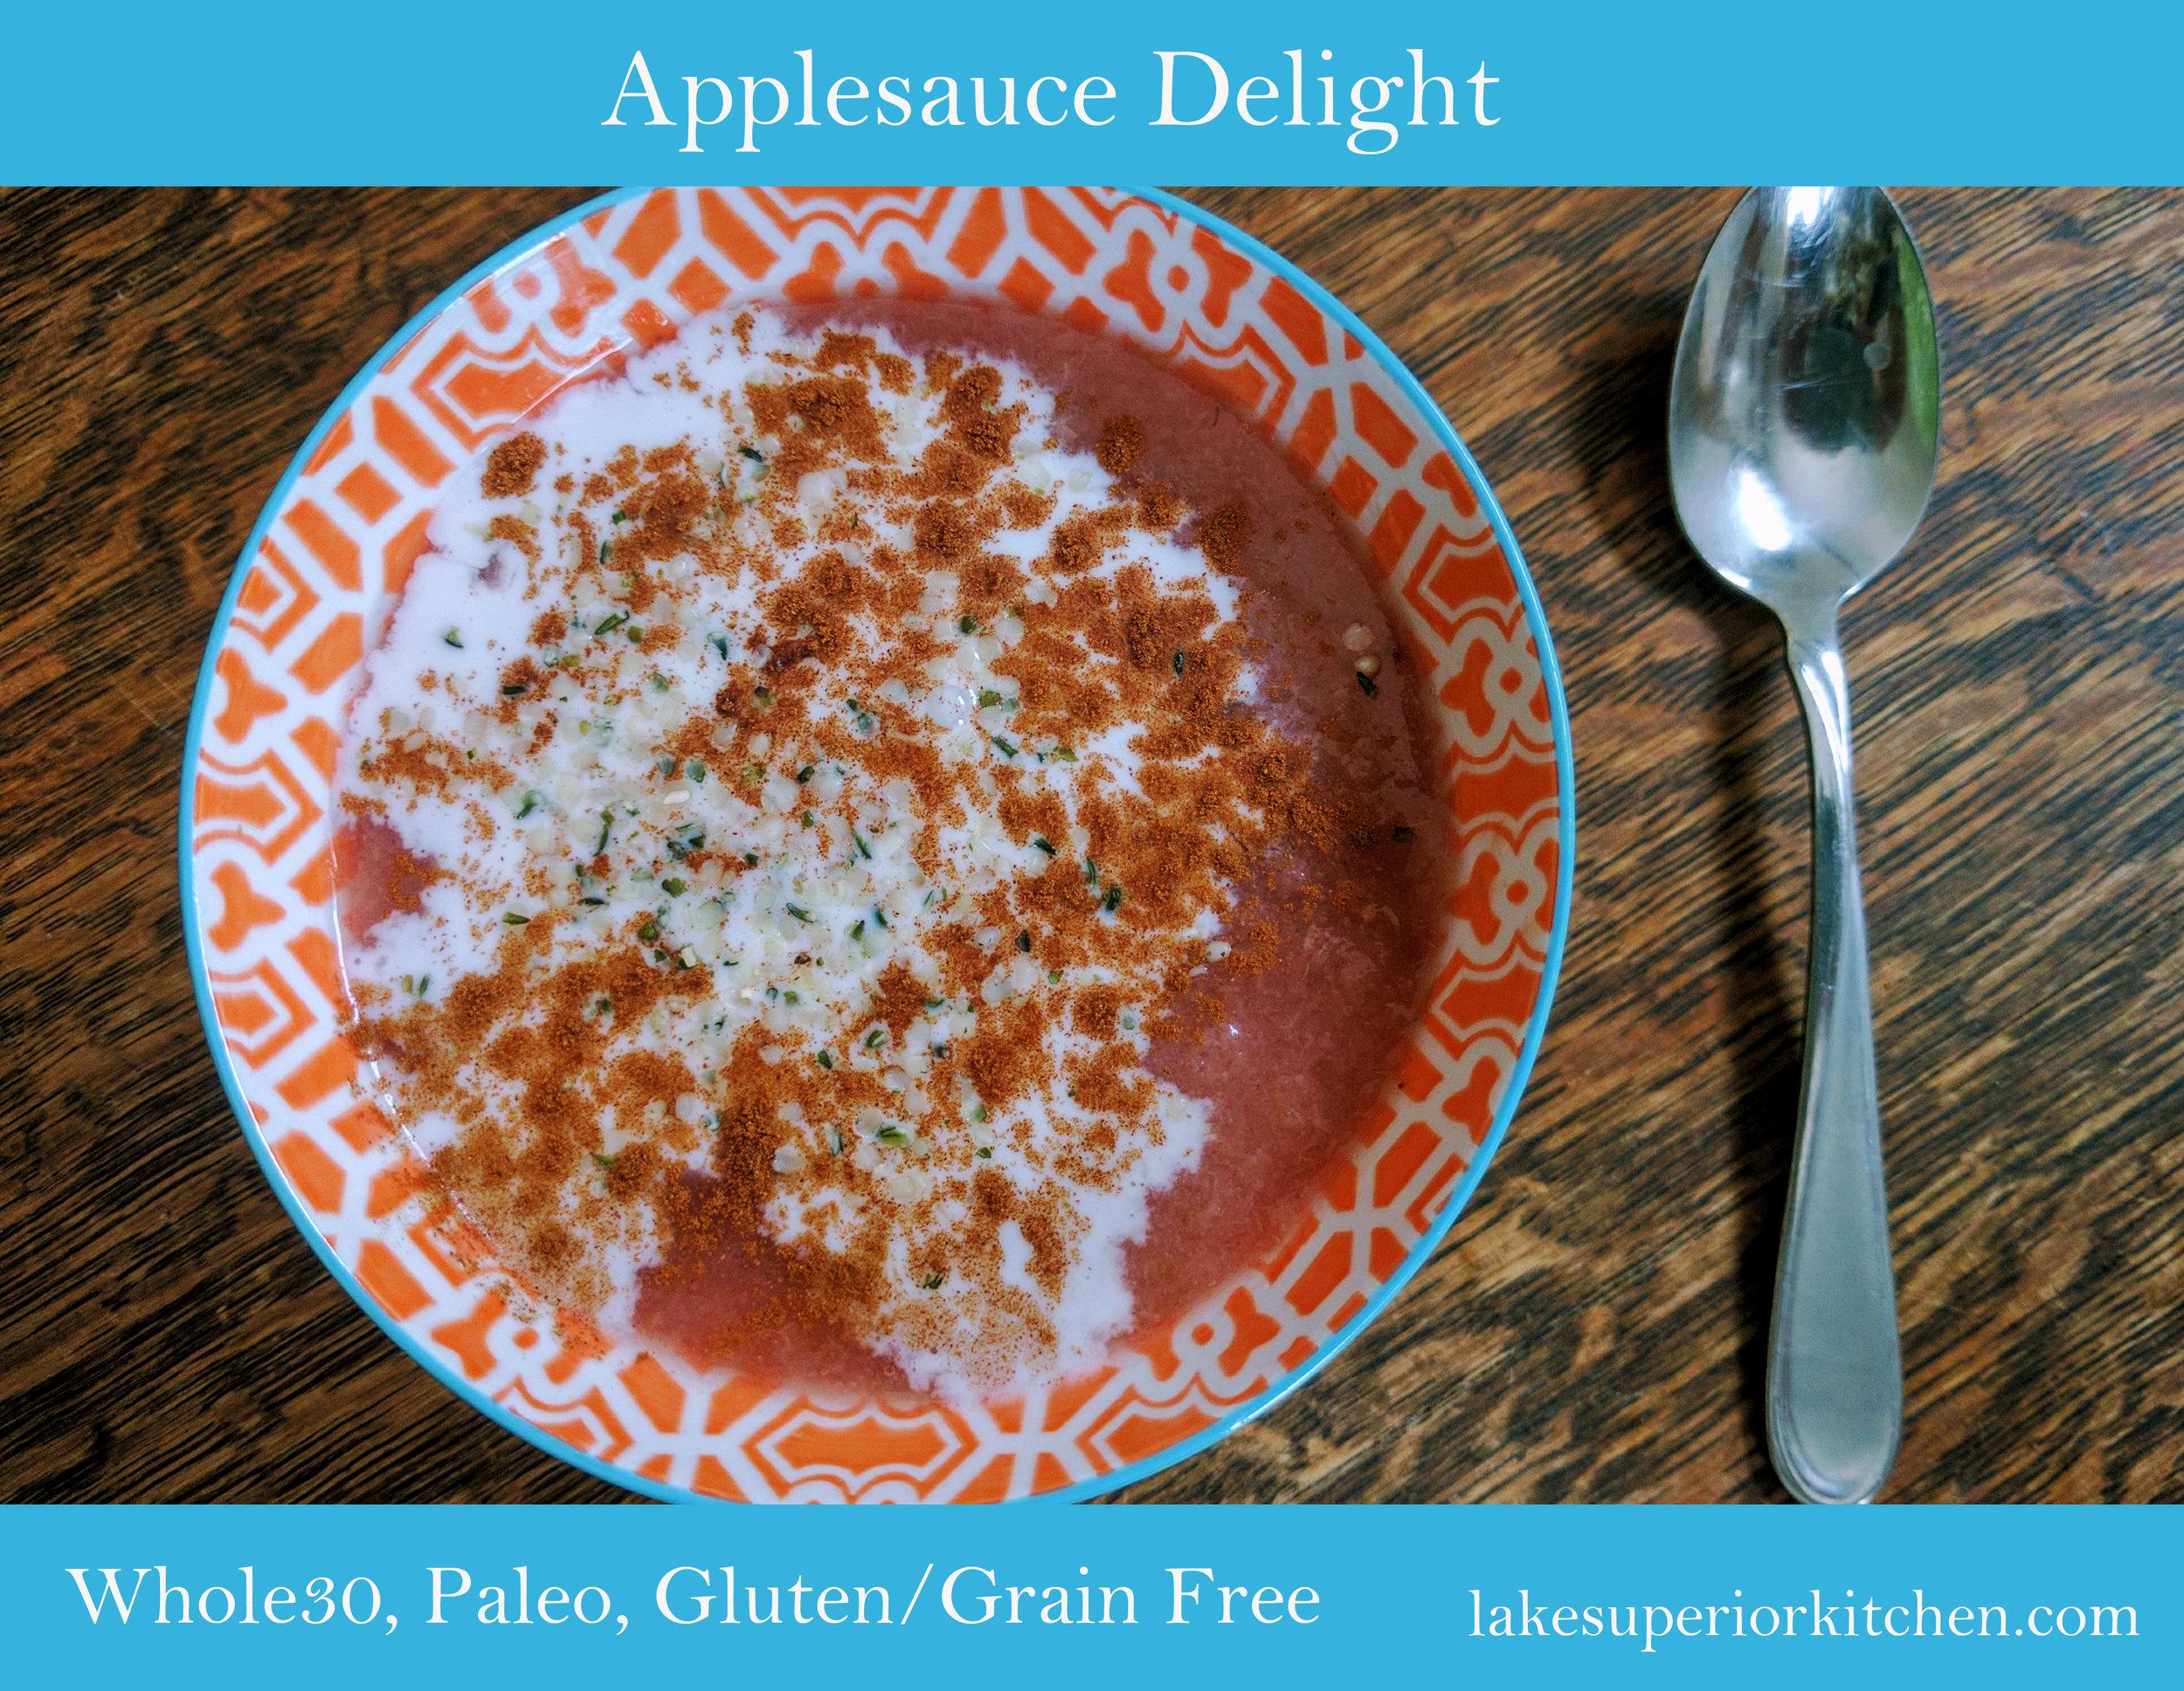 applesauce delight, whole30, paleo, healthy snack, hemp